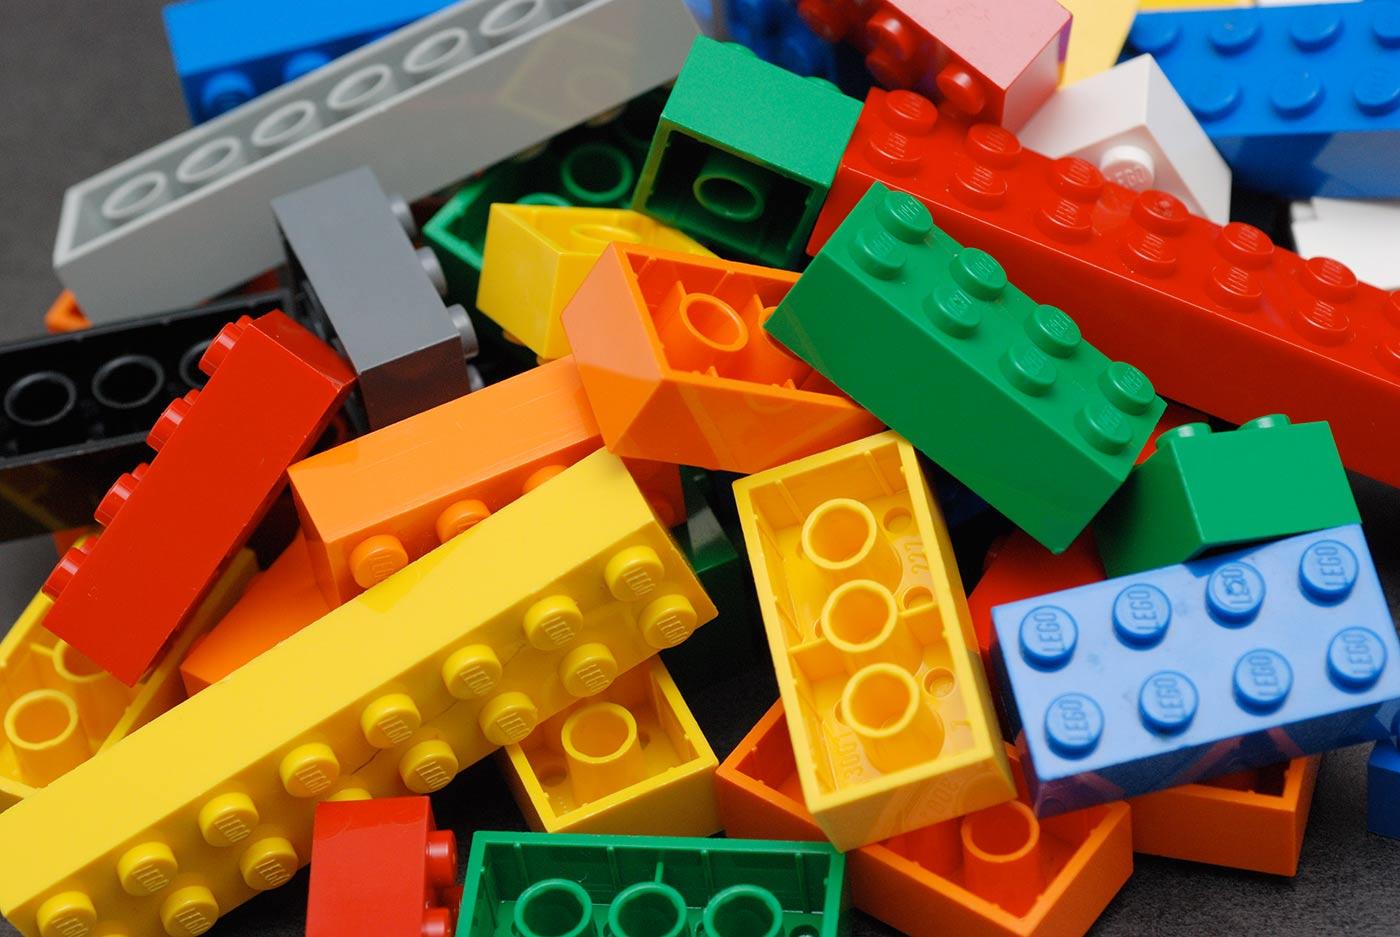 A pile of Lego bricks.